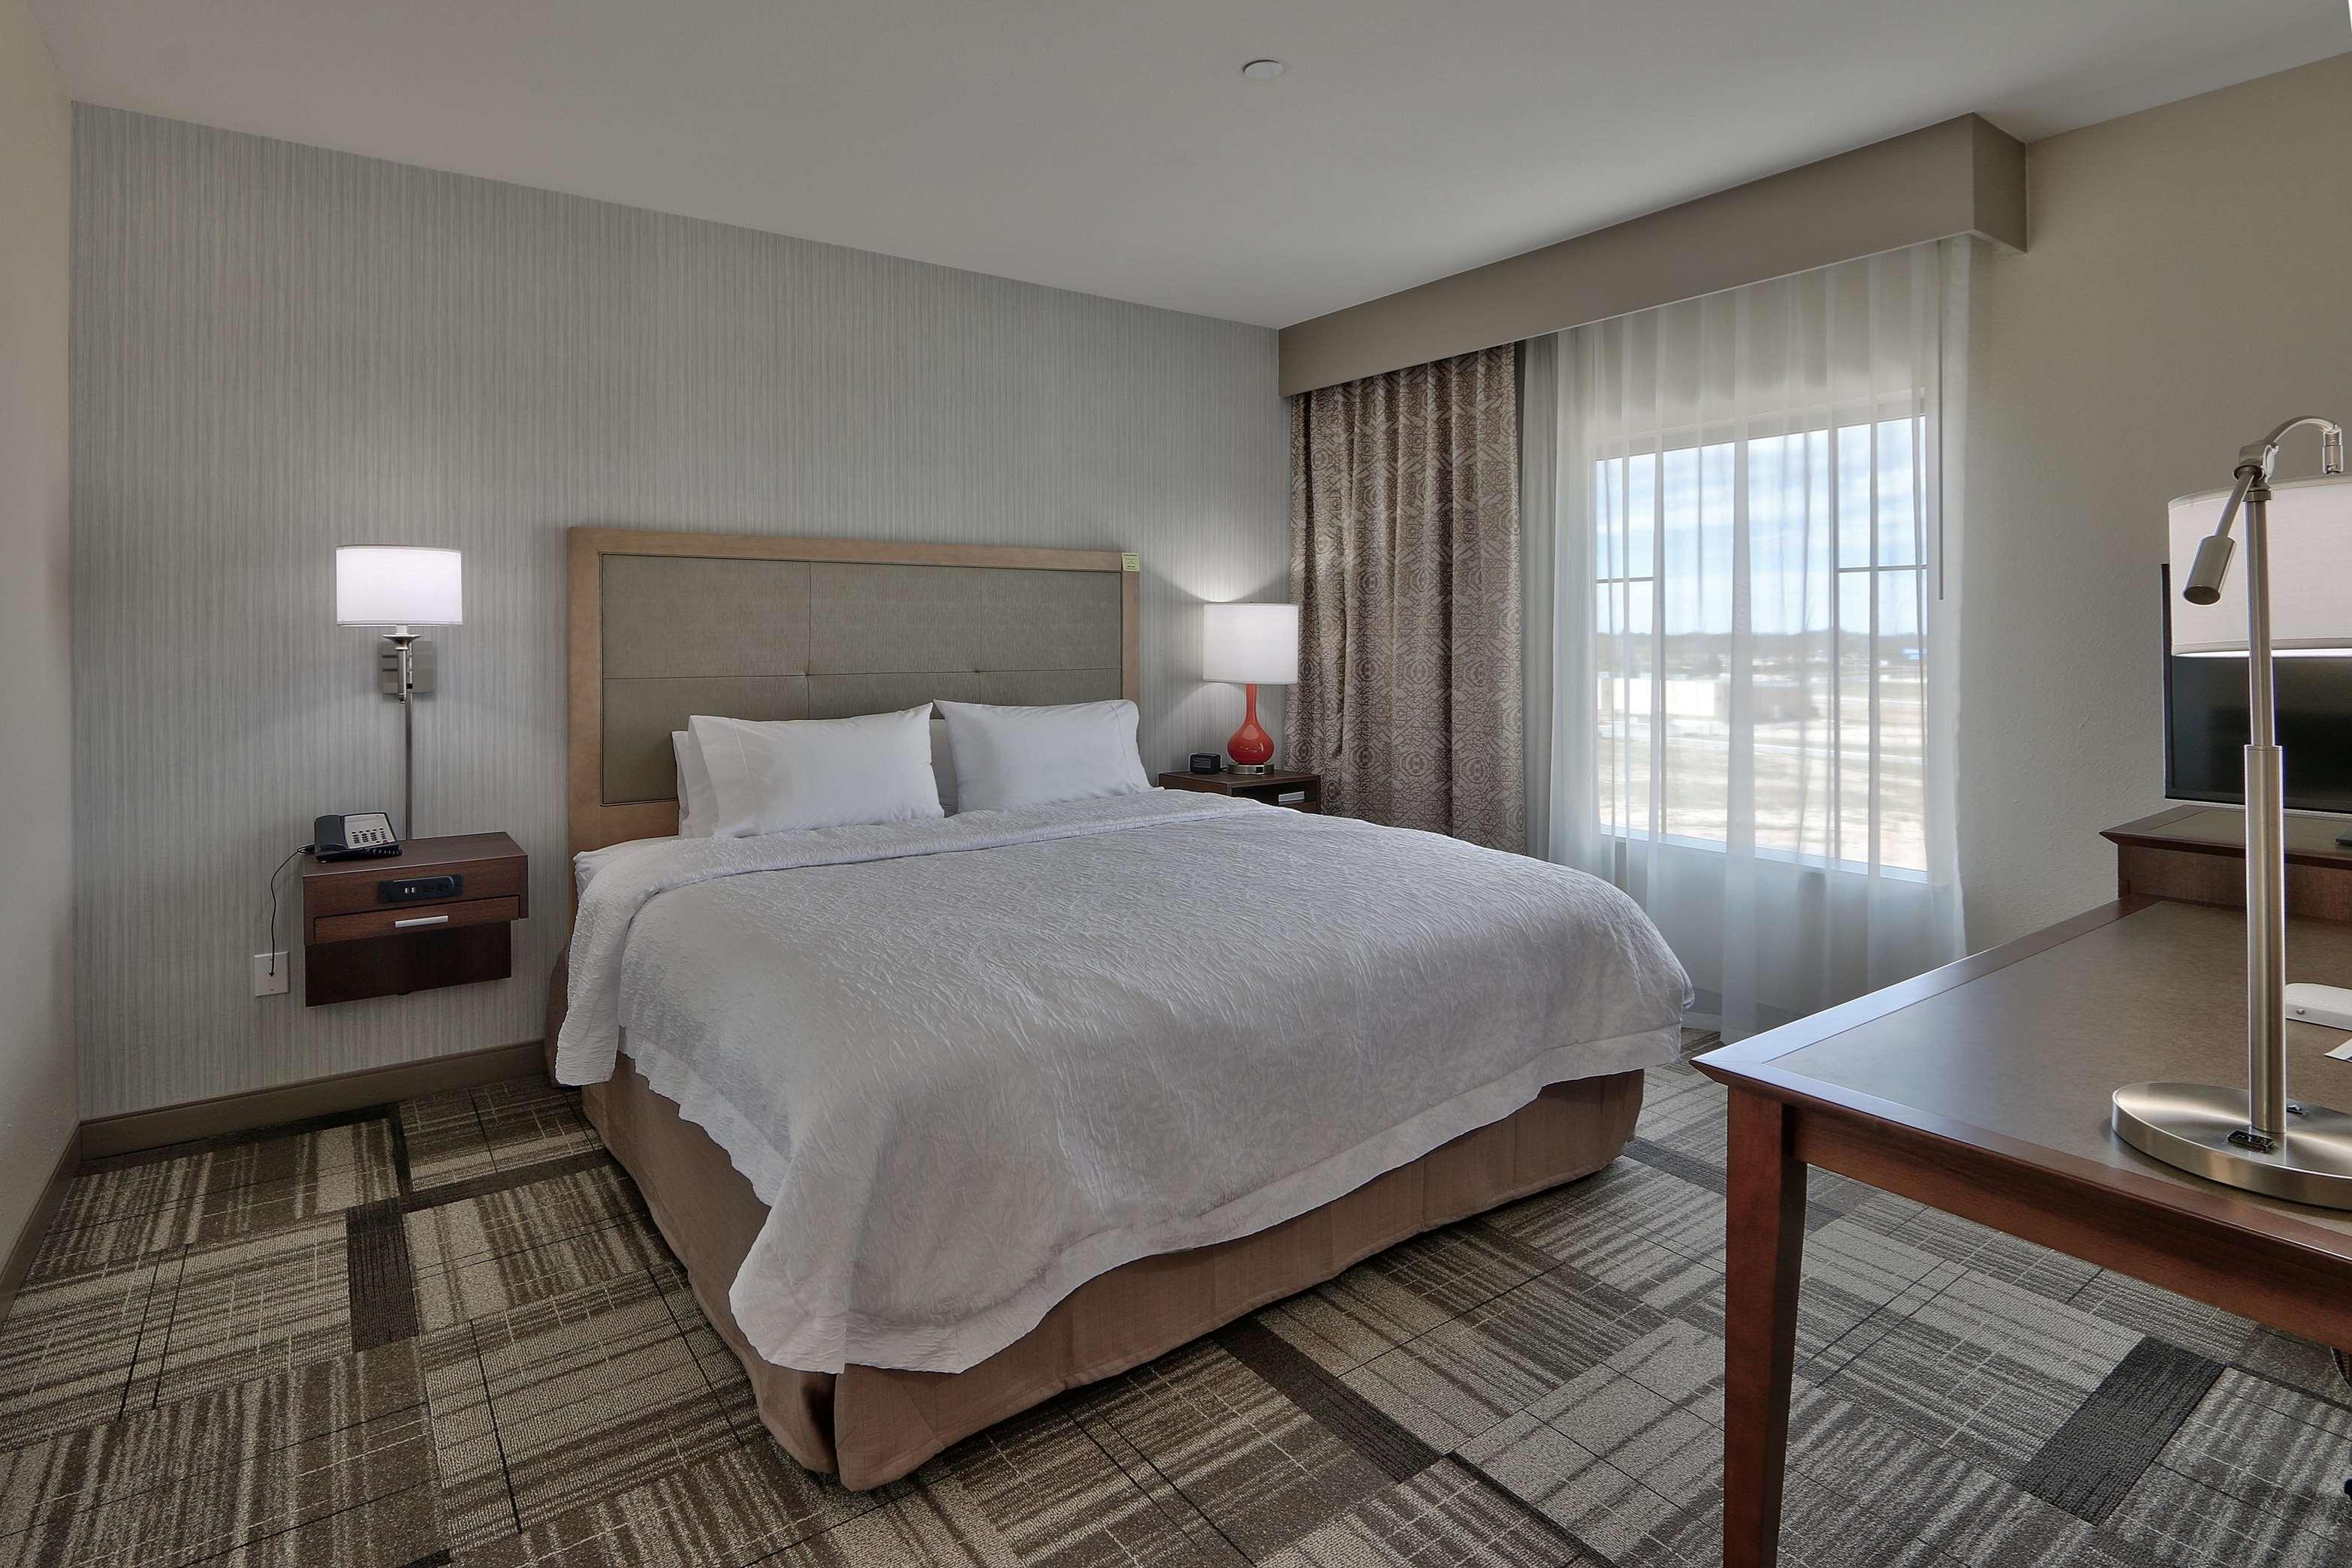 Hampton Inn & Suites Artesia image 21